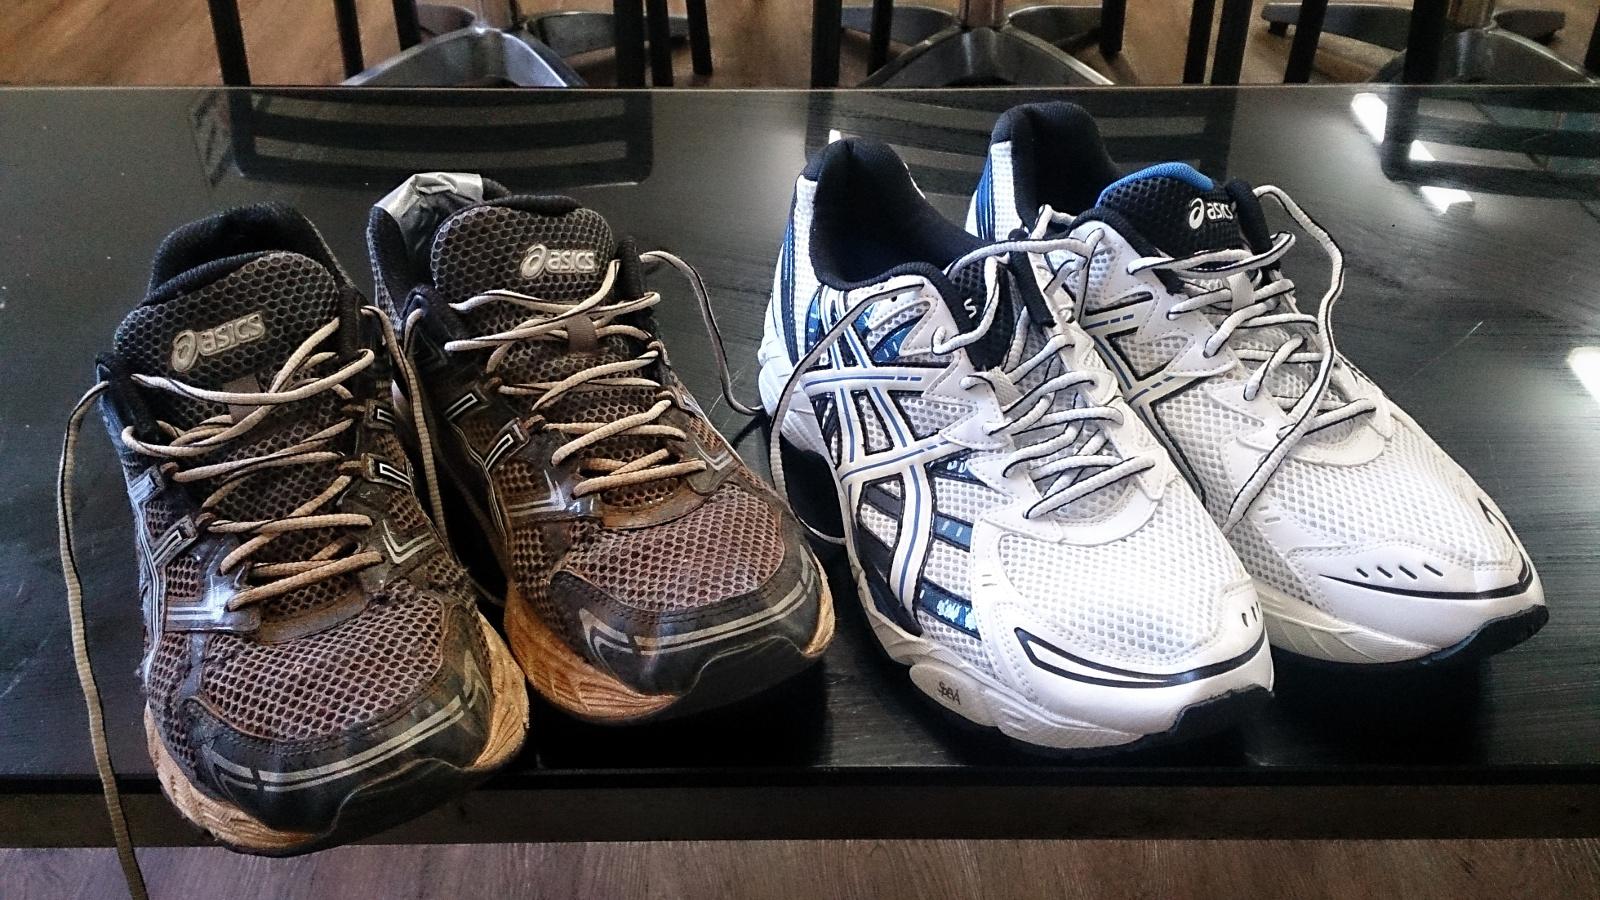 Kieran Rae Borderwalk Australia trainers shoes